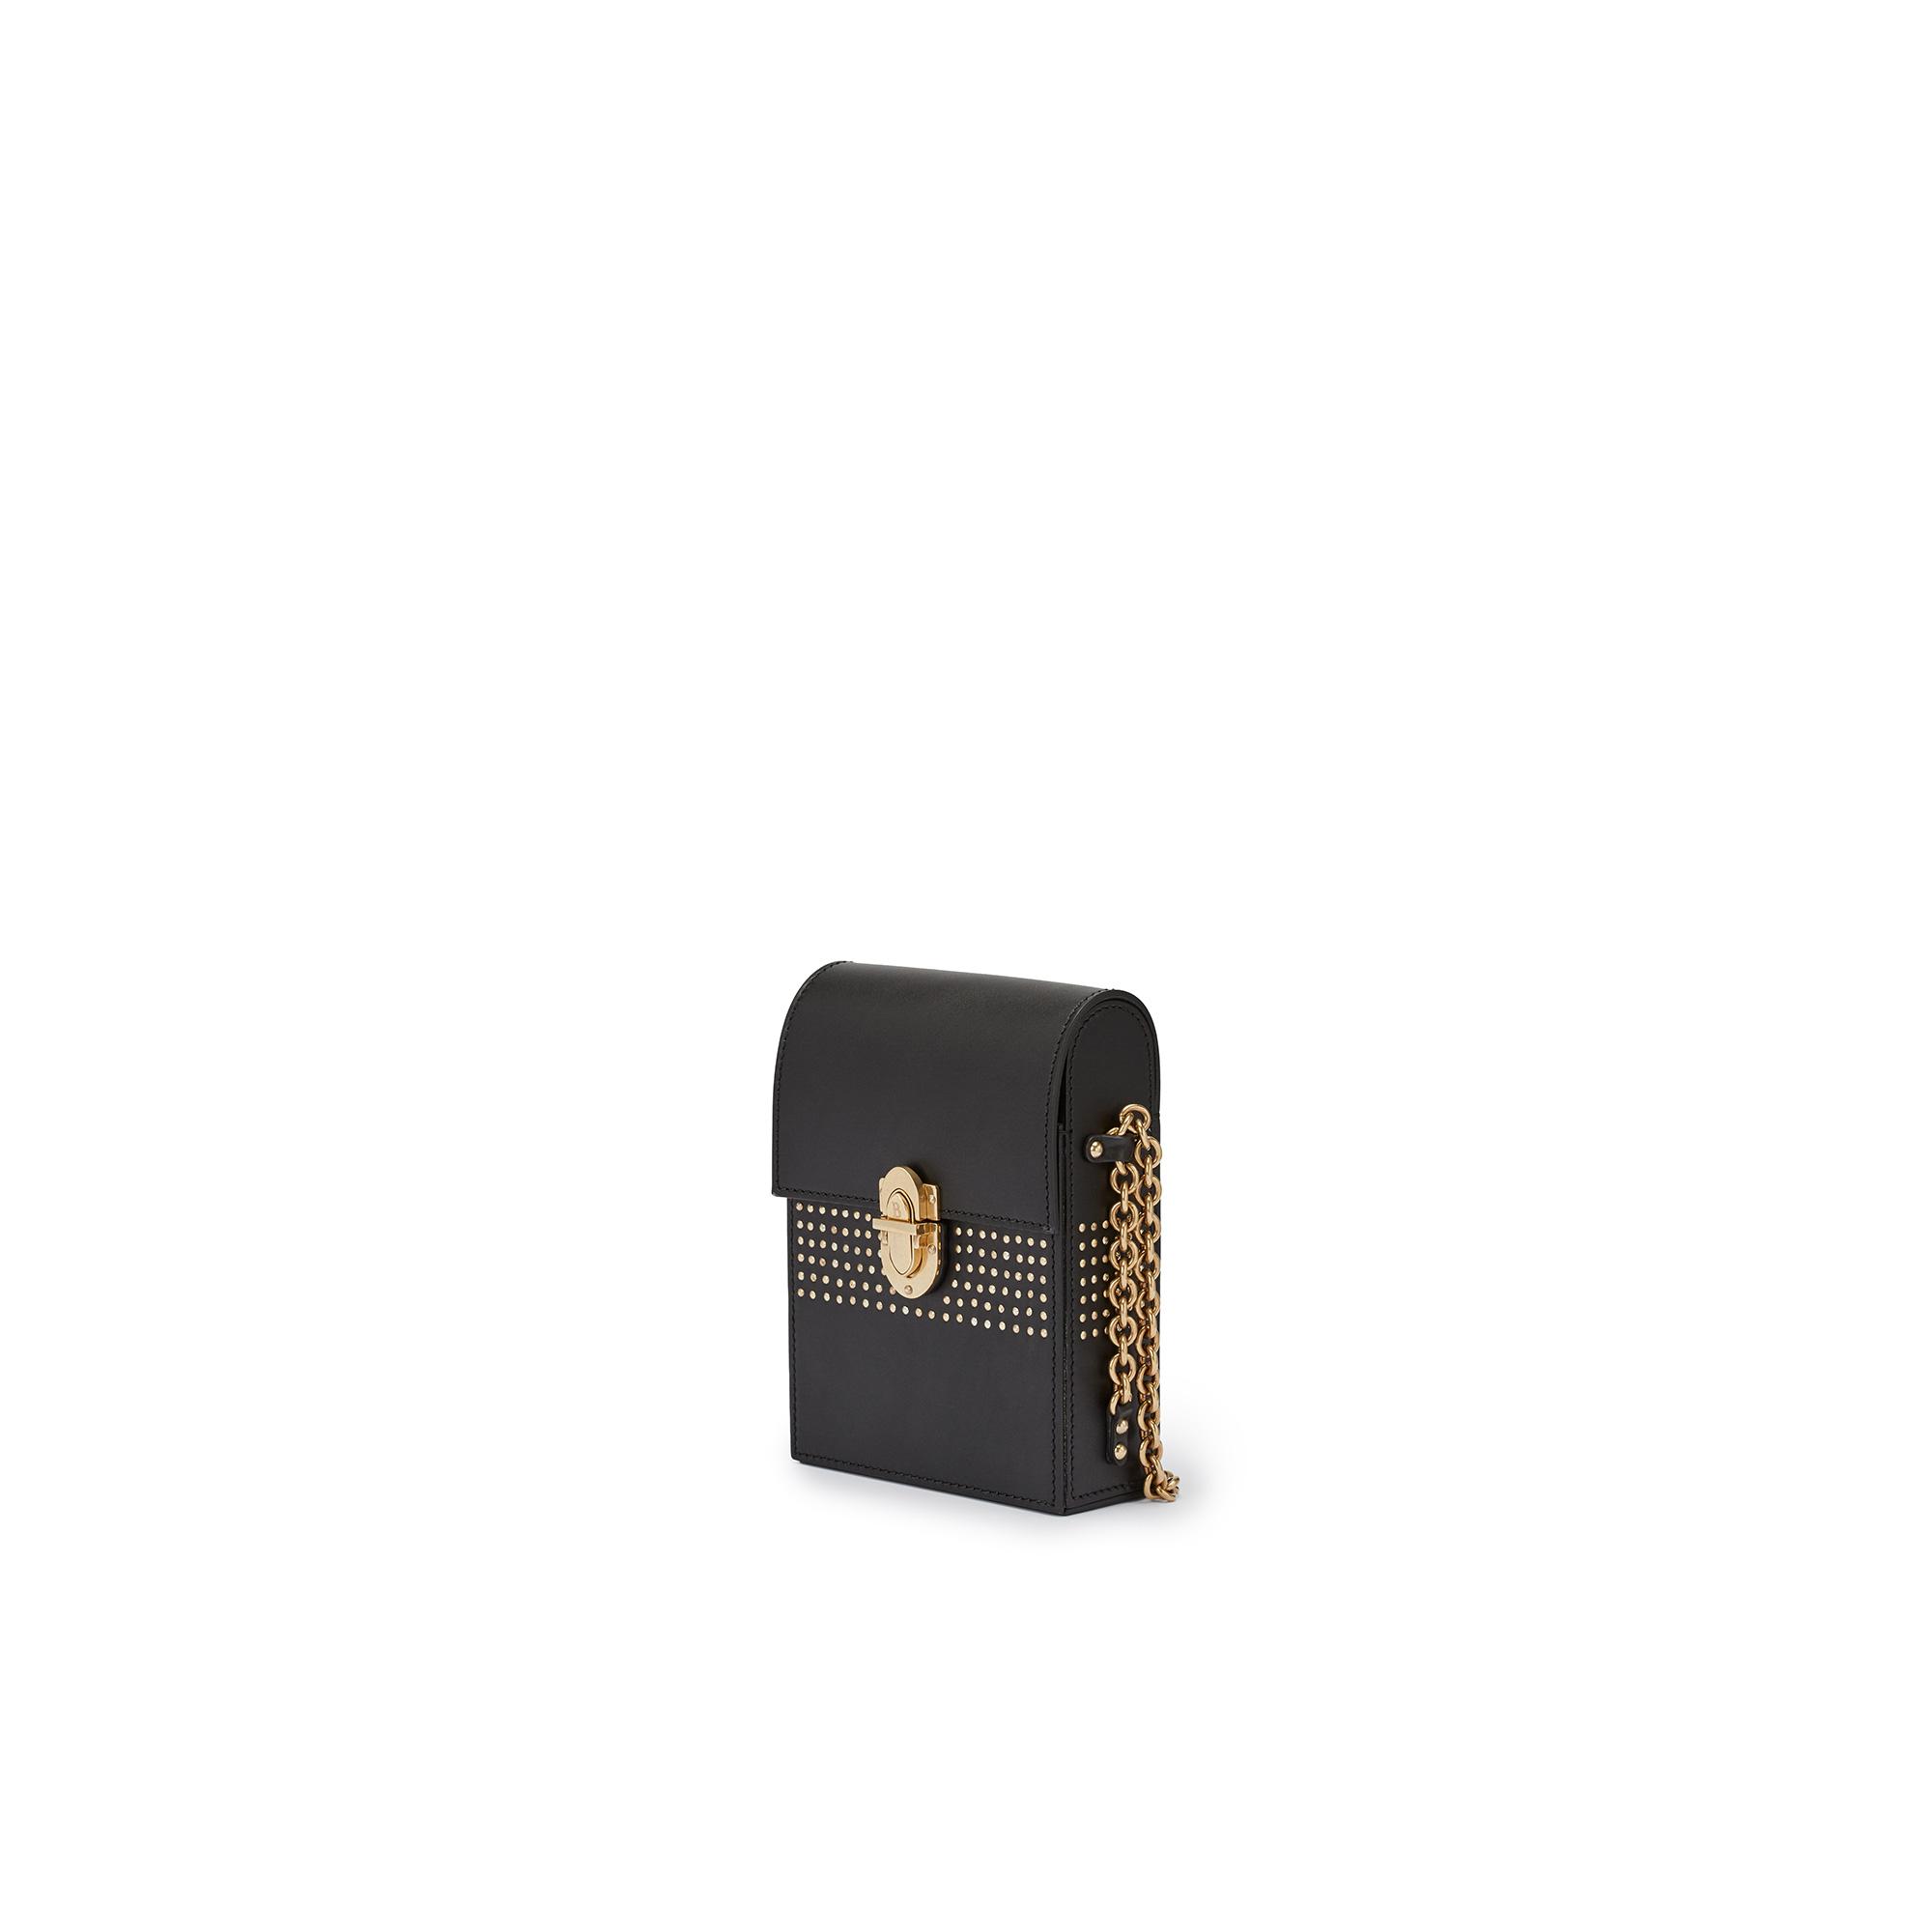 Mini-Gigi-black-french-calf-bag-Bertoni-1949_01